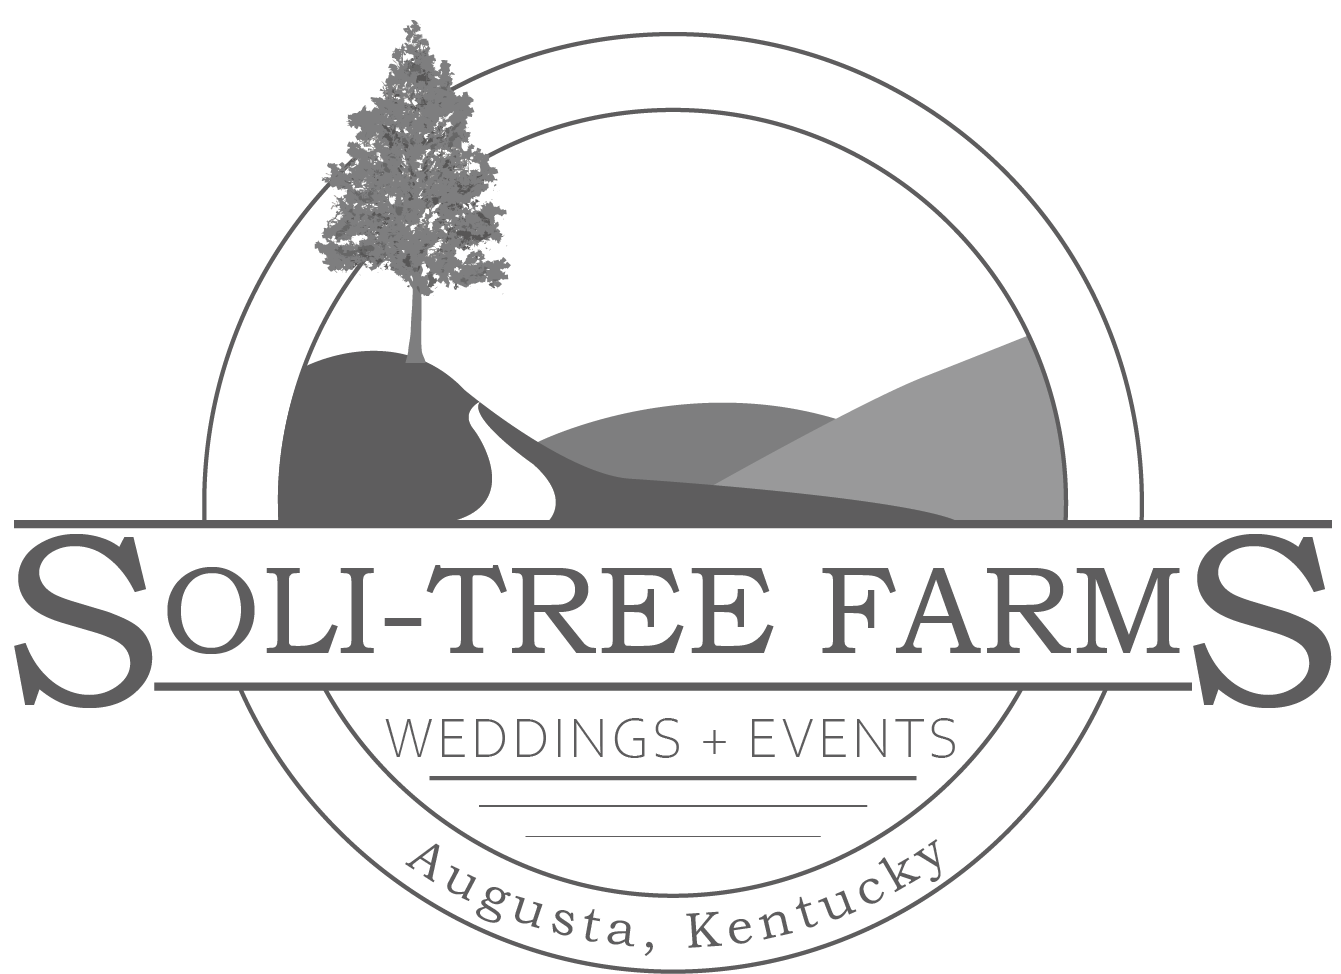 Soli-Tree Farms